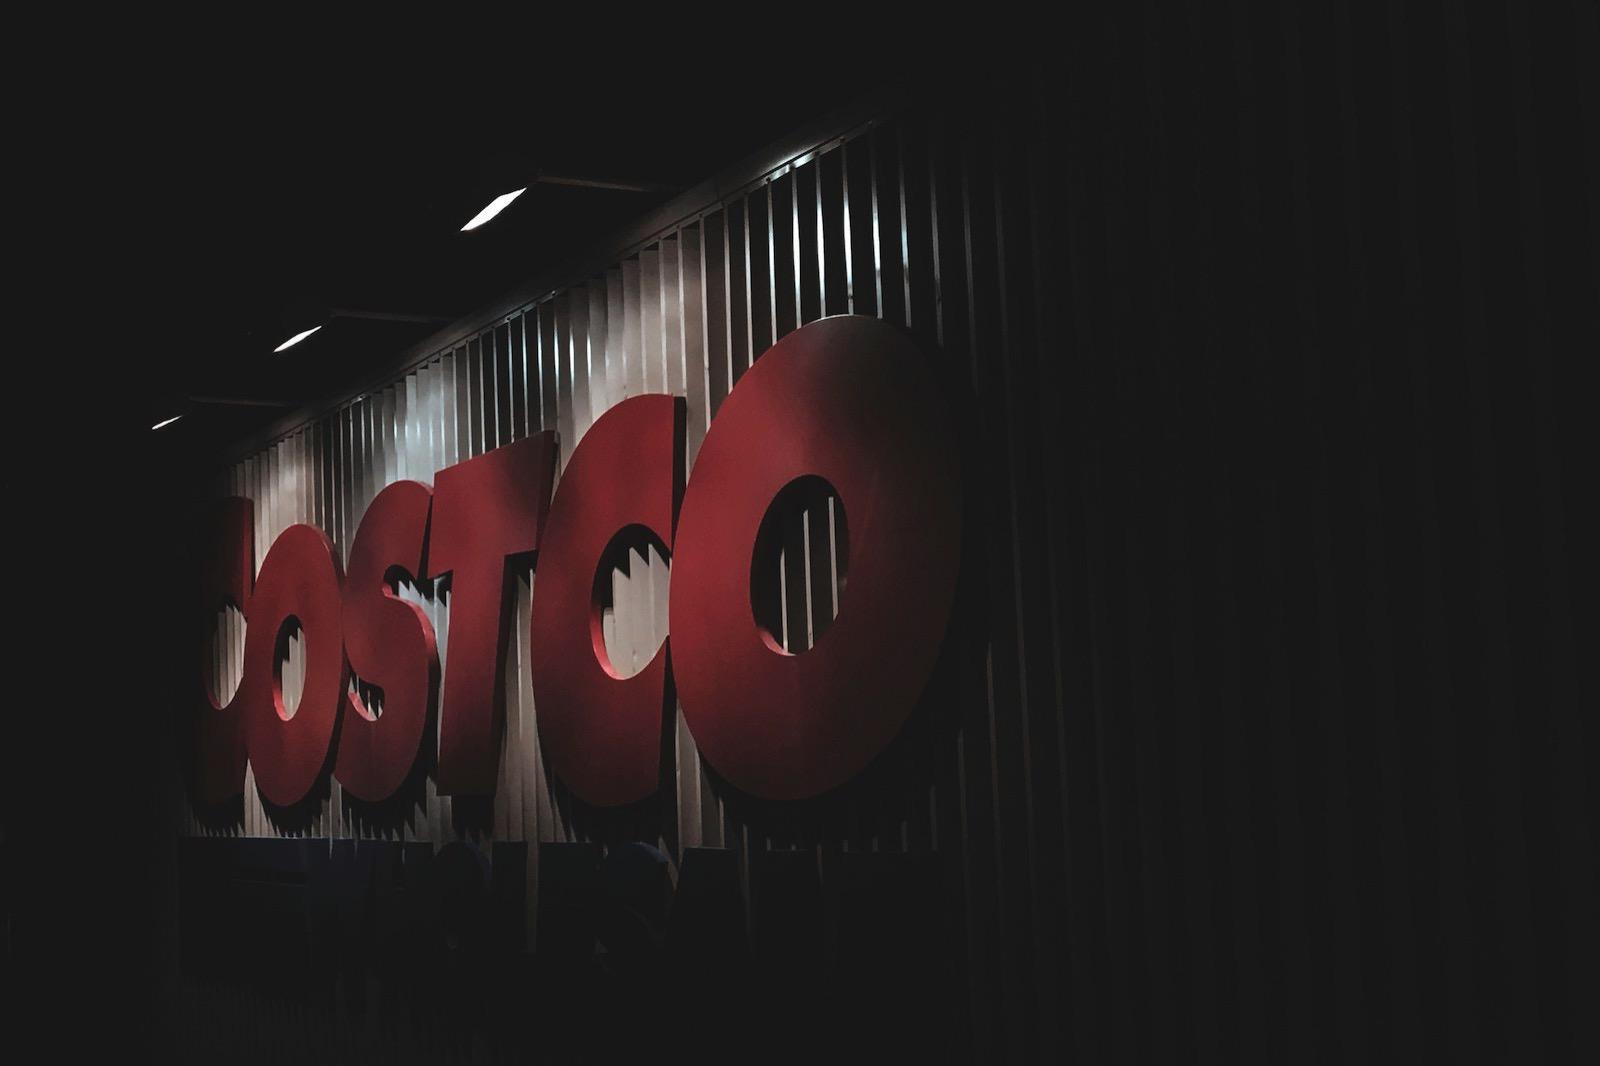 henry-co-800605-unsplash-costco-logo-dark.jpg